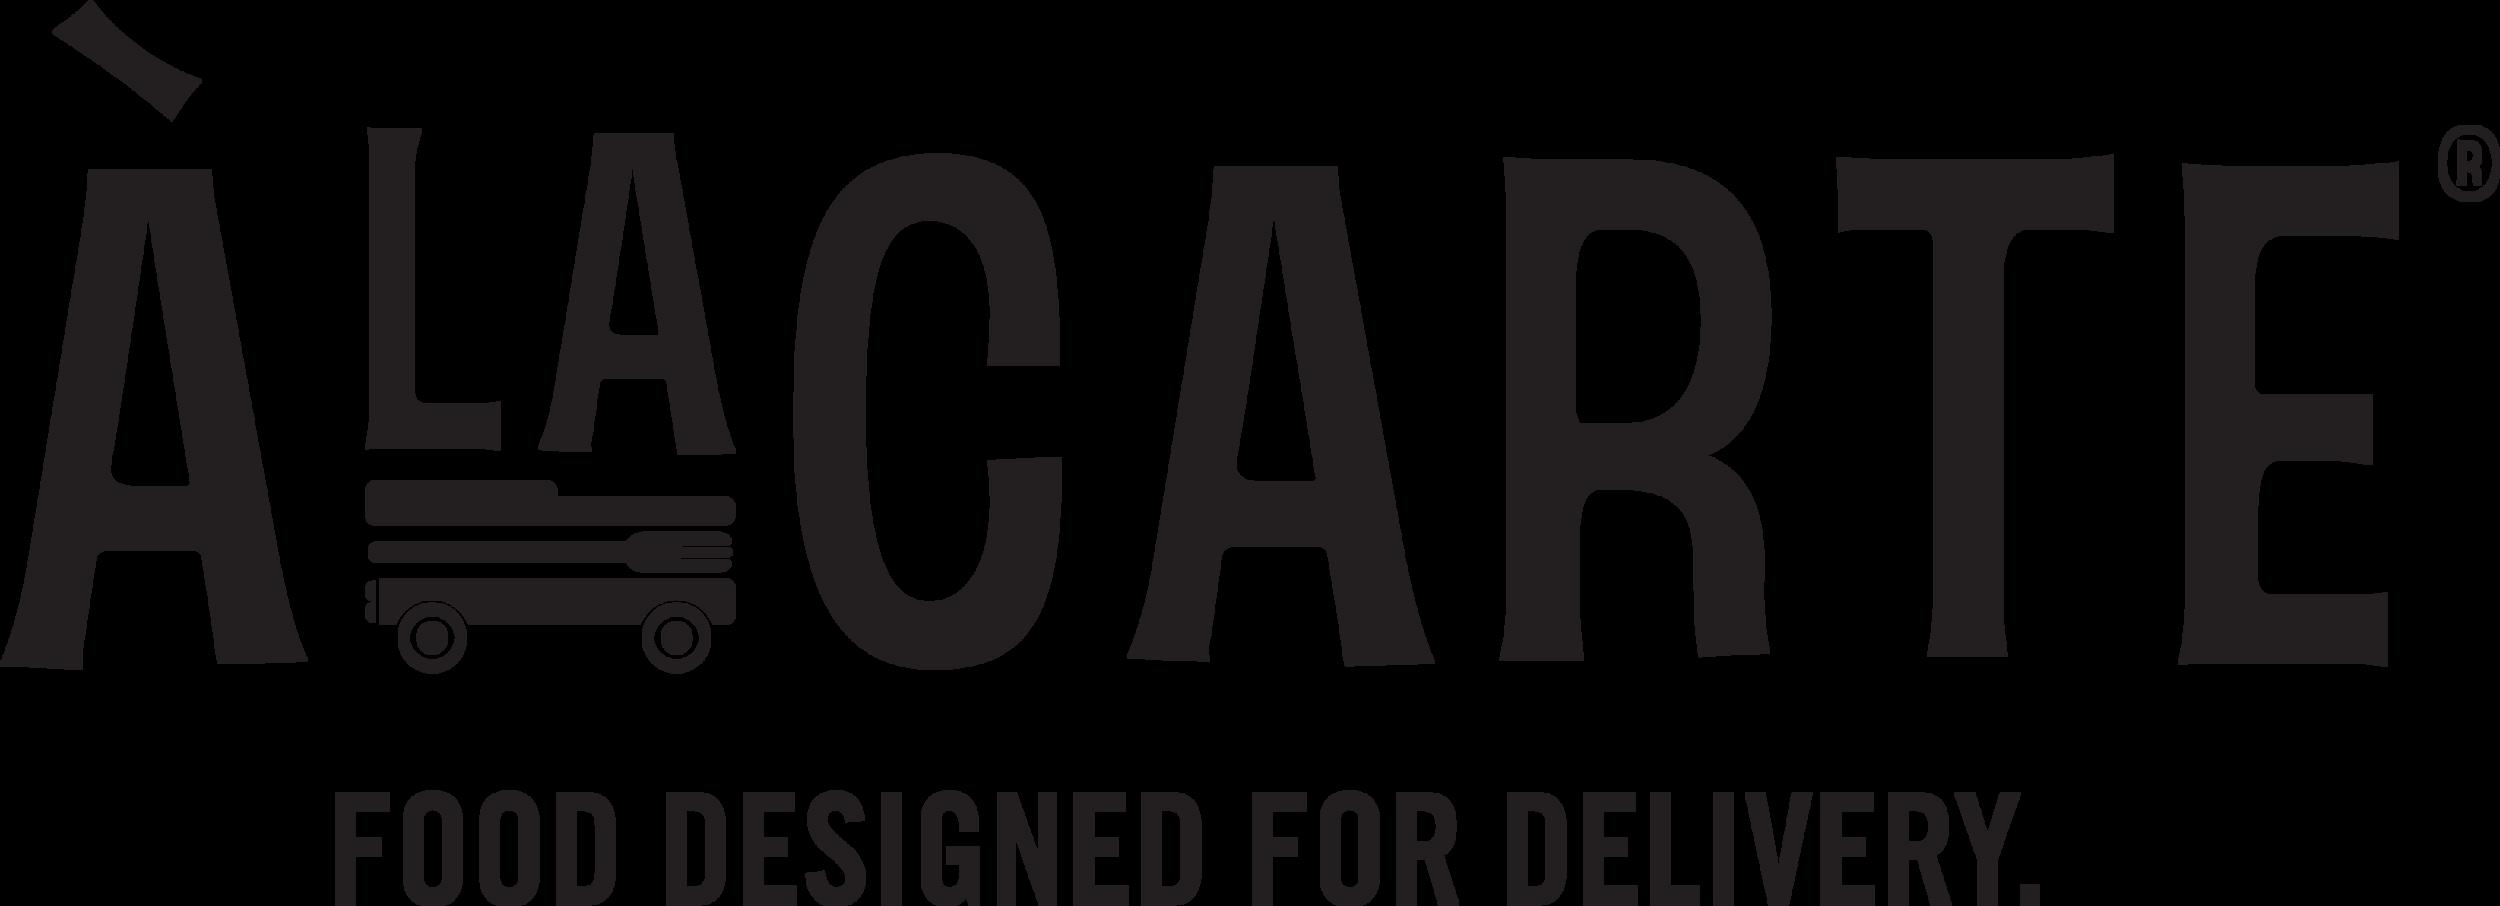 ÁLaCarte-tagline.png